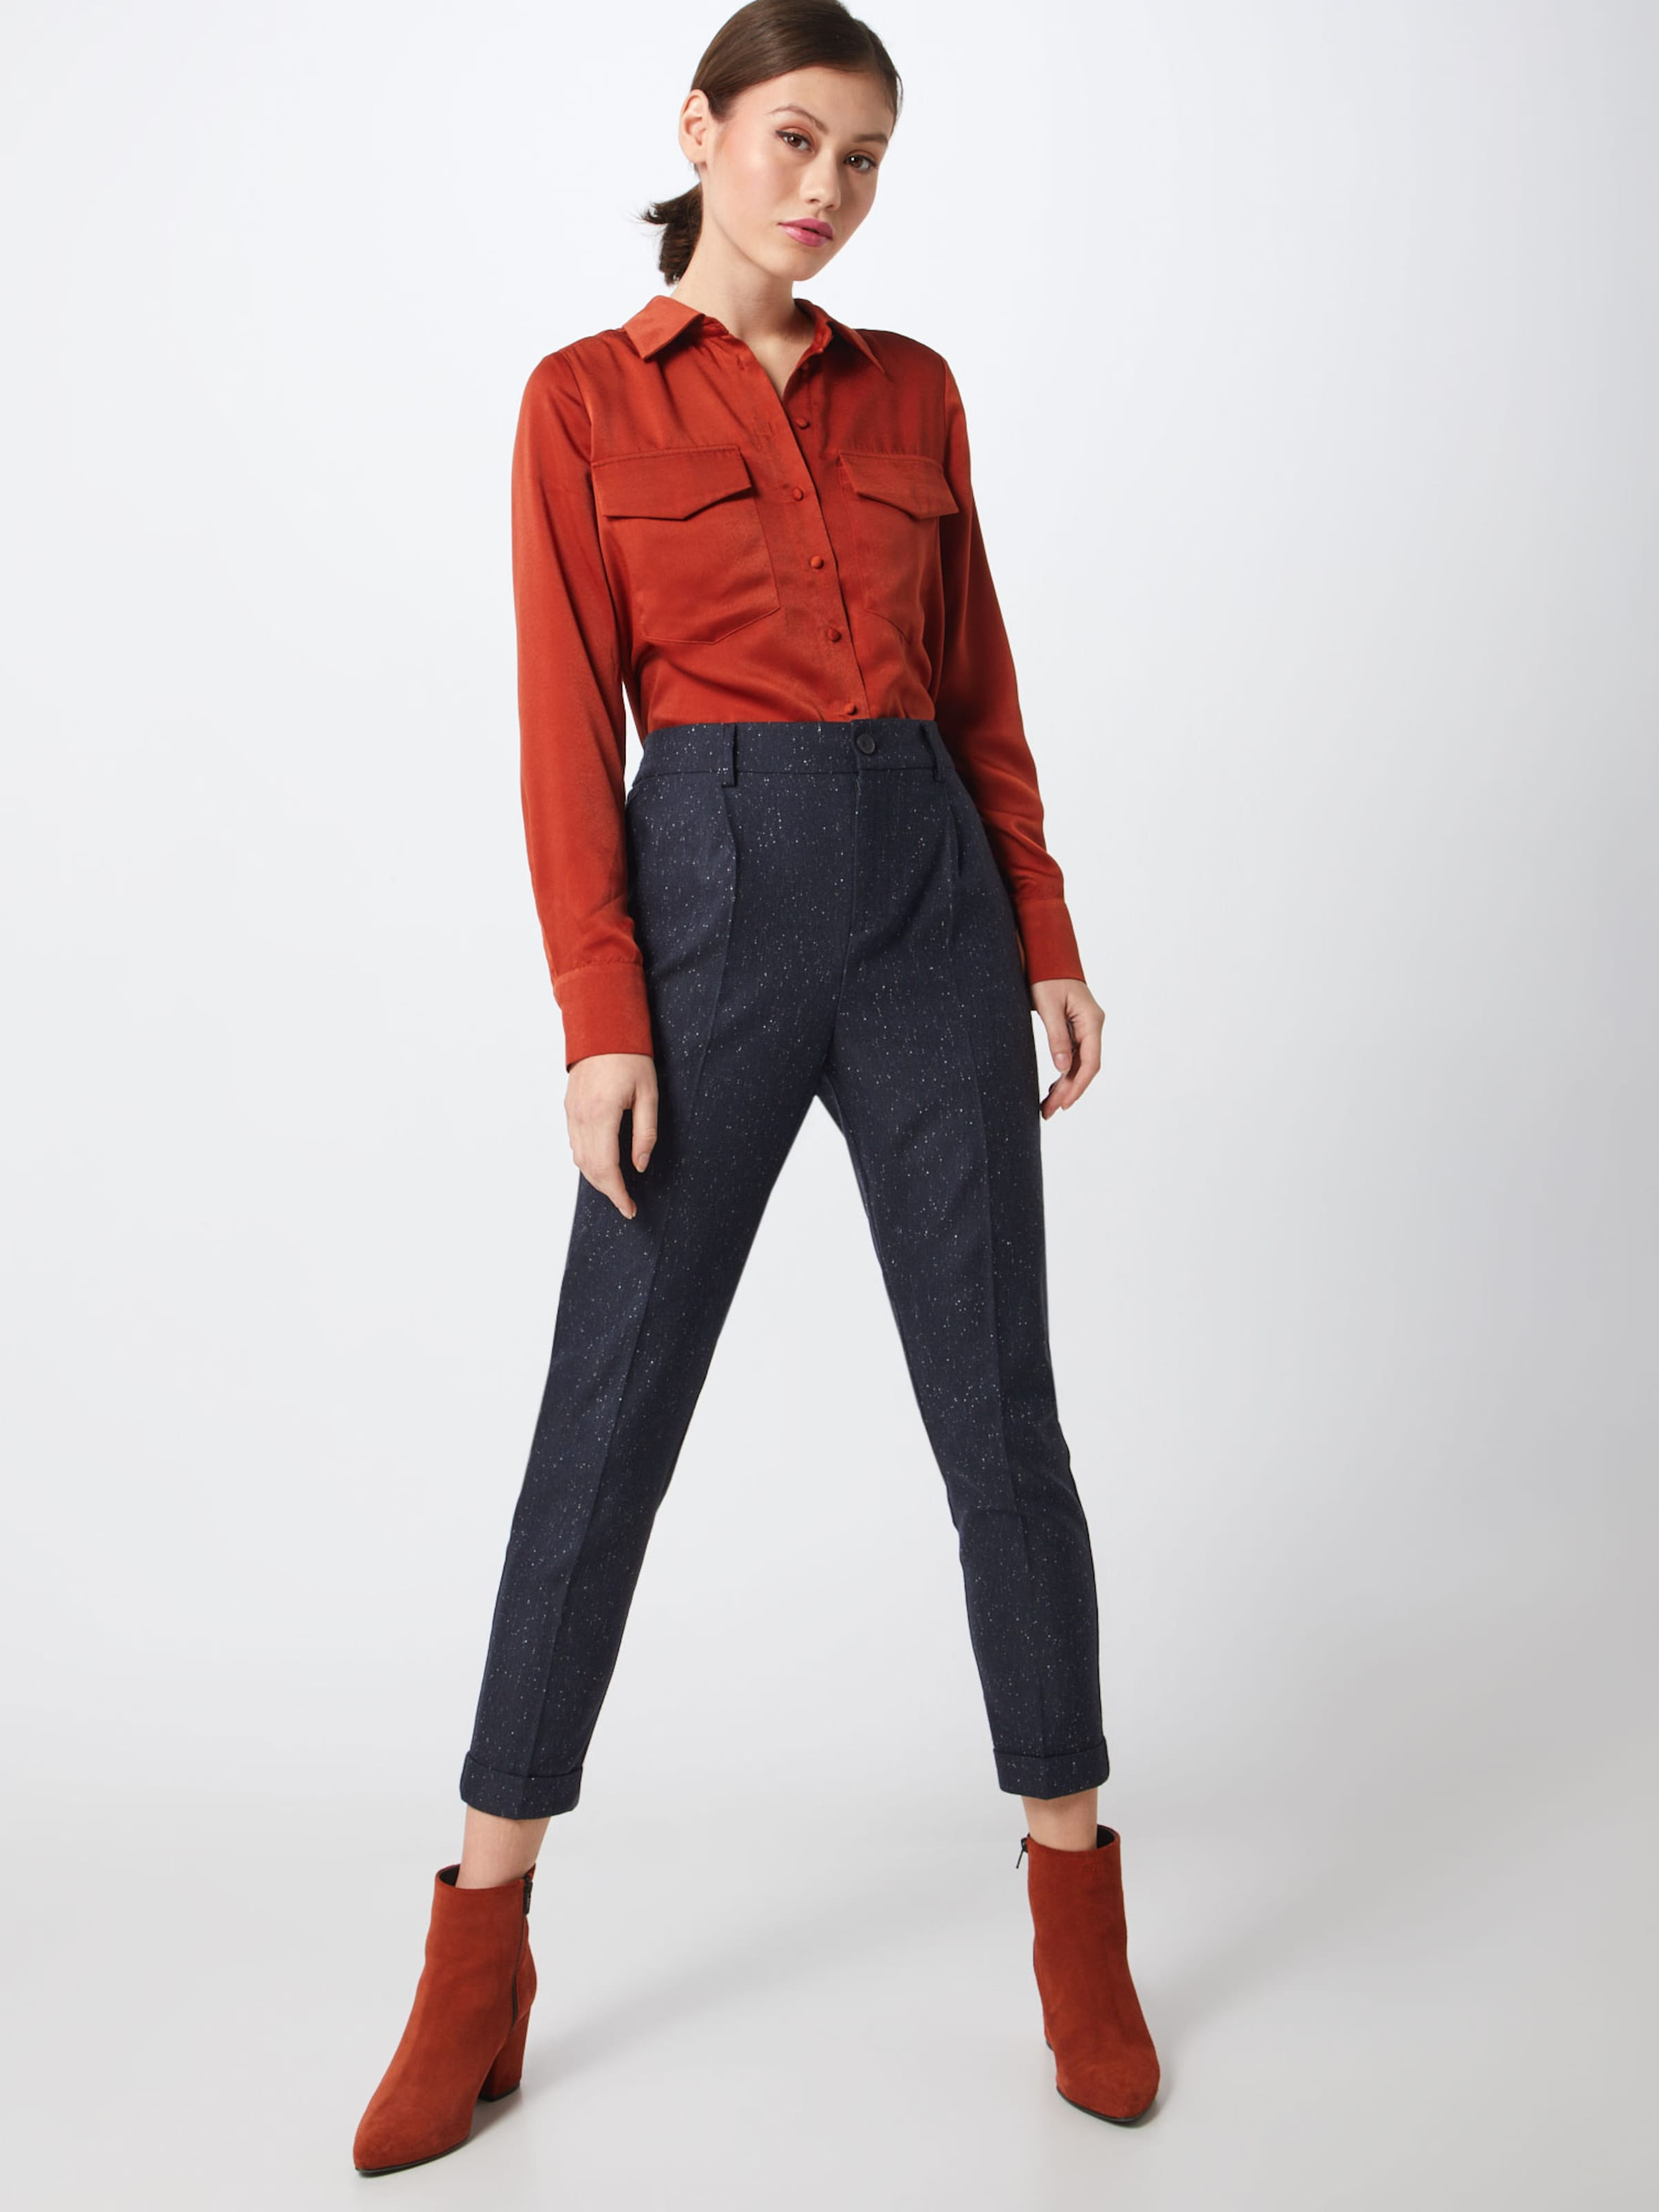 'tweed À Bleu chino' Label En oliver Red Marine Plis Pantalon S LqzMpGVSU